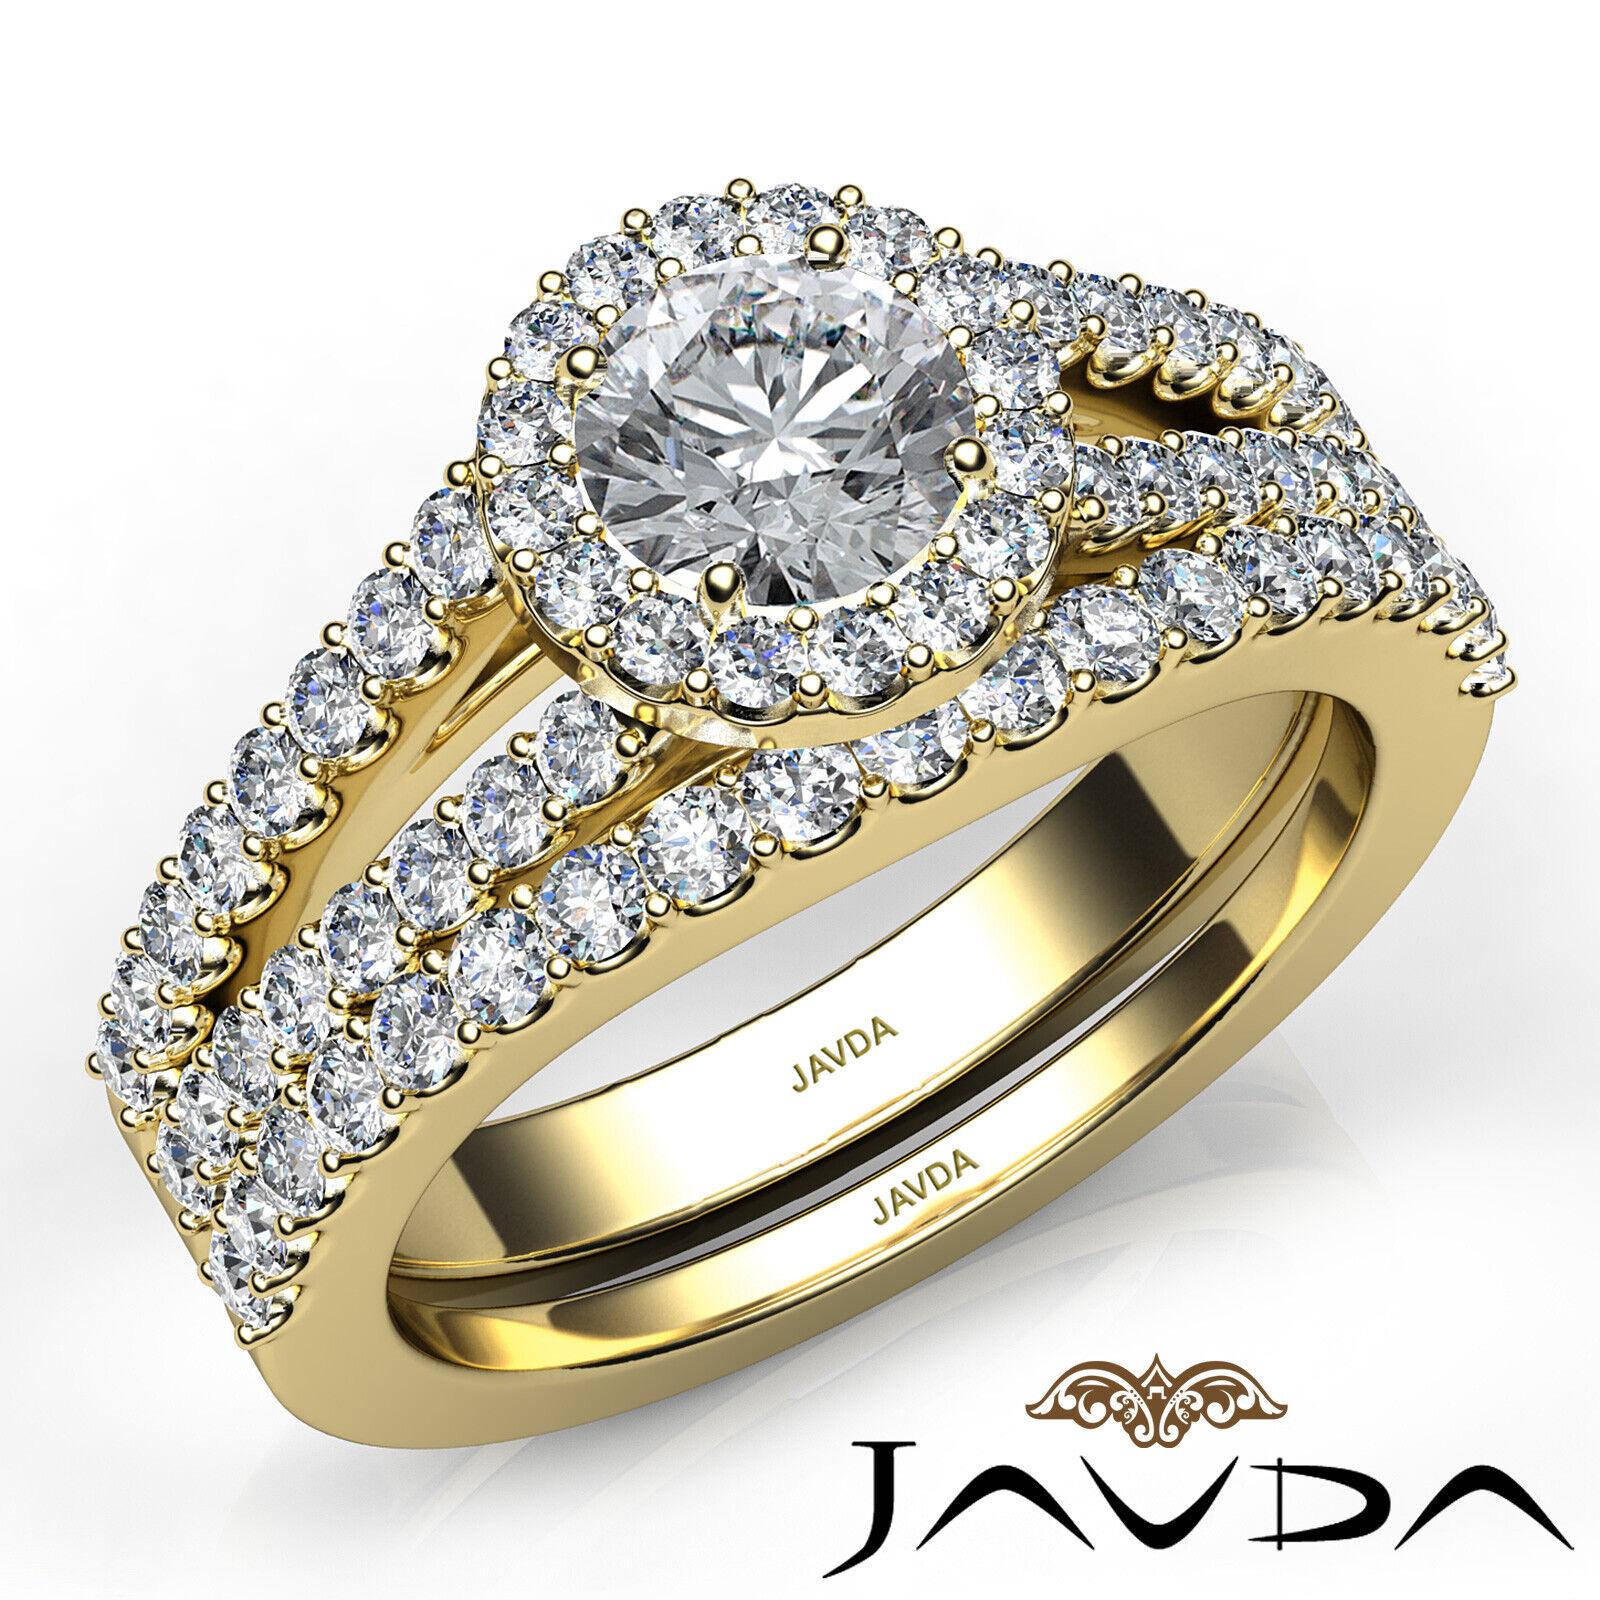 1.85ctw Luxurious Wedding Bridal Round Diamond Engagement Ring GIA G-VVS1 W Gold 9